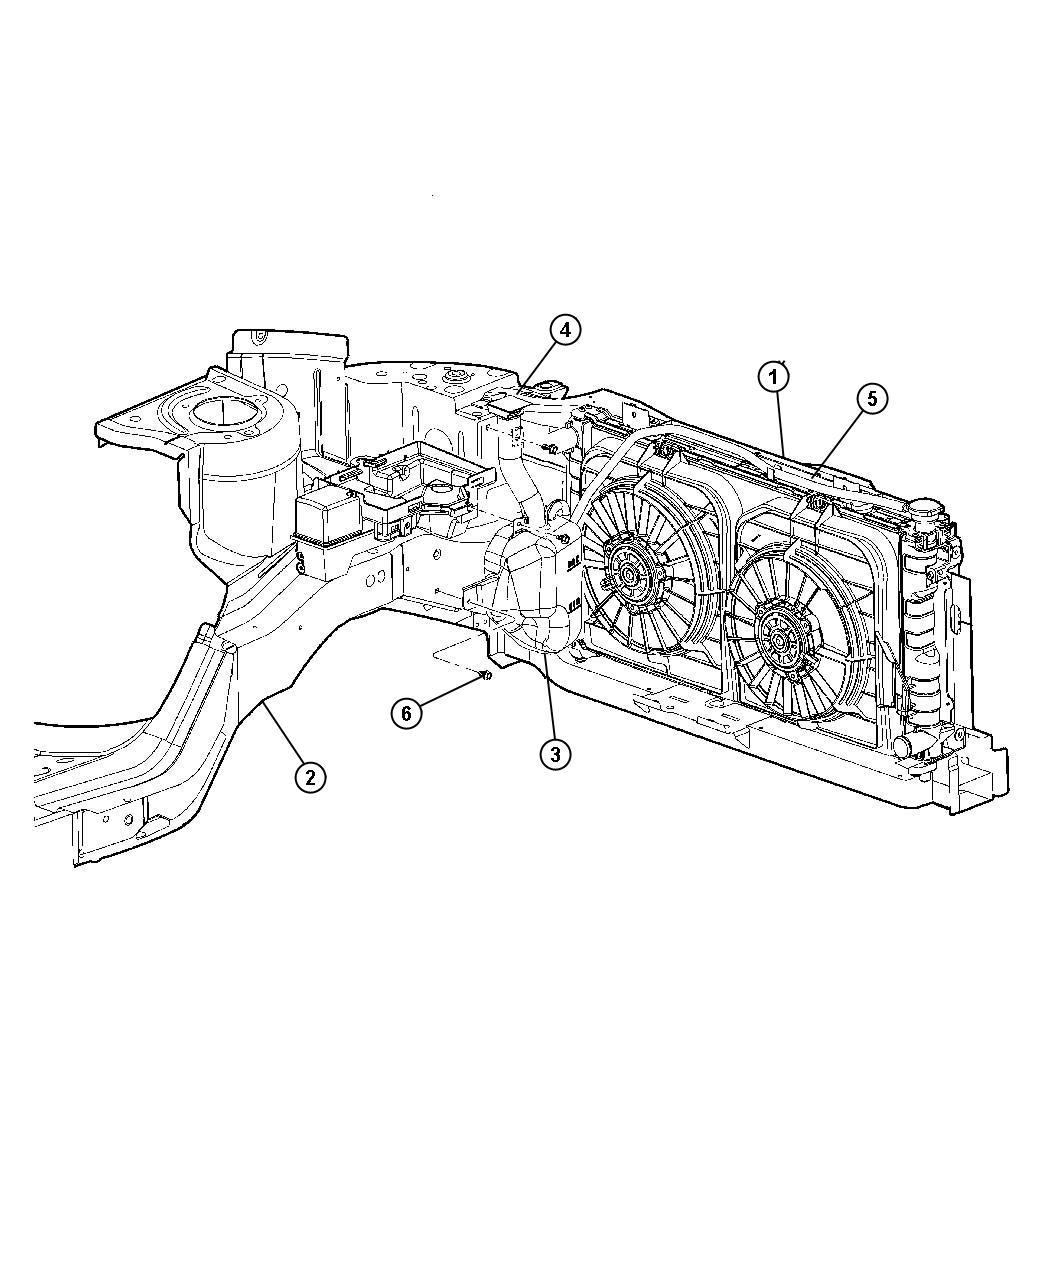 Jeep Liberty Bottle Coolant Reserve Tank Engine